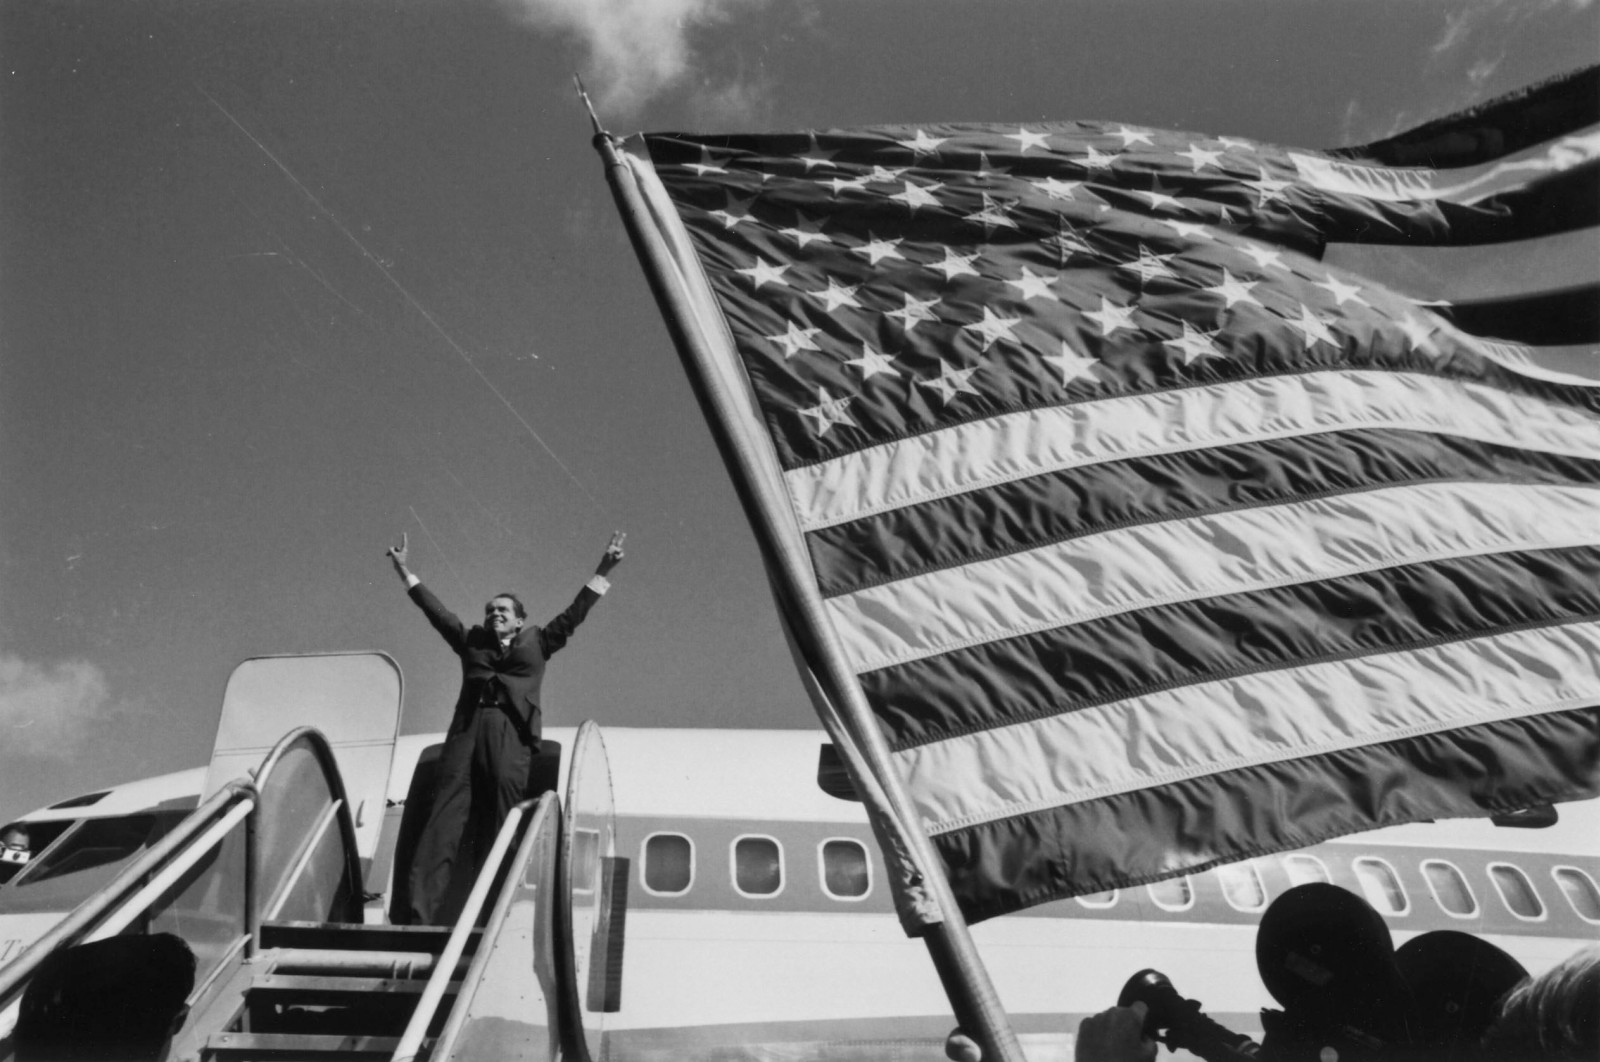 Raymond Depardon , Sioux City, Iowa, 1968 - Magnum Photos